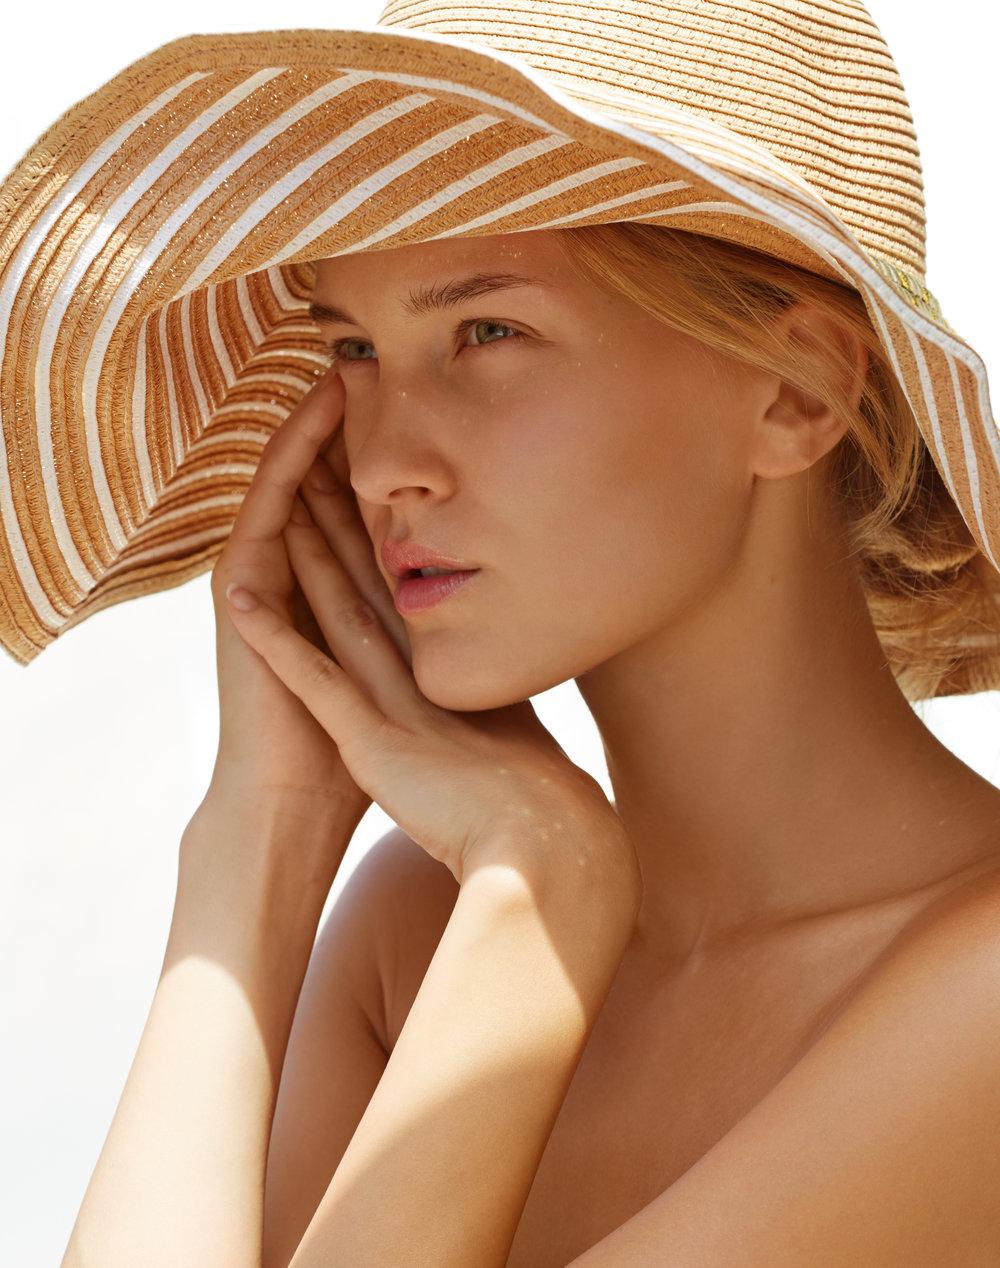 Anna Dabrowska beauty 039.jpg